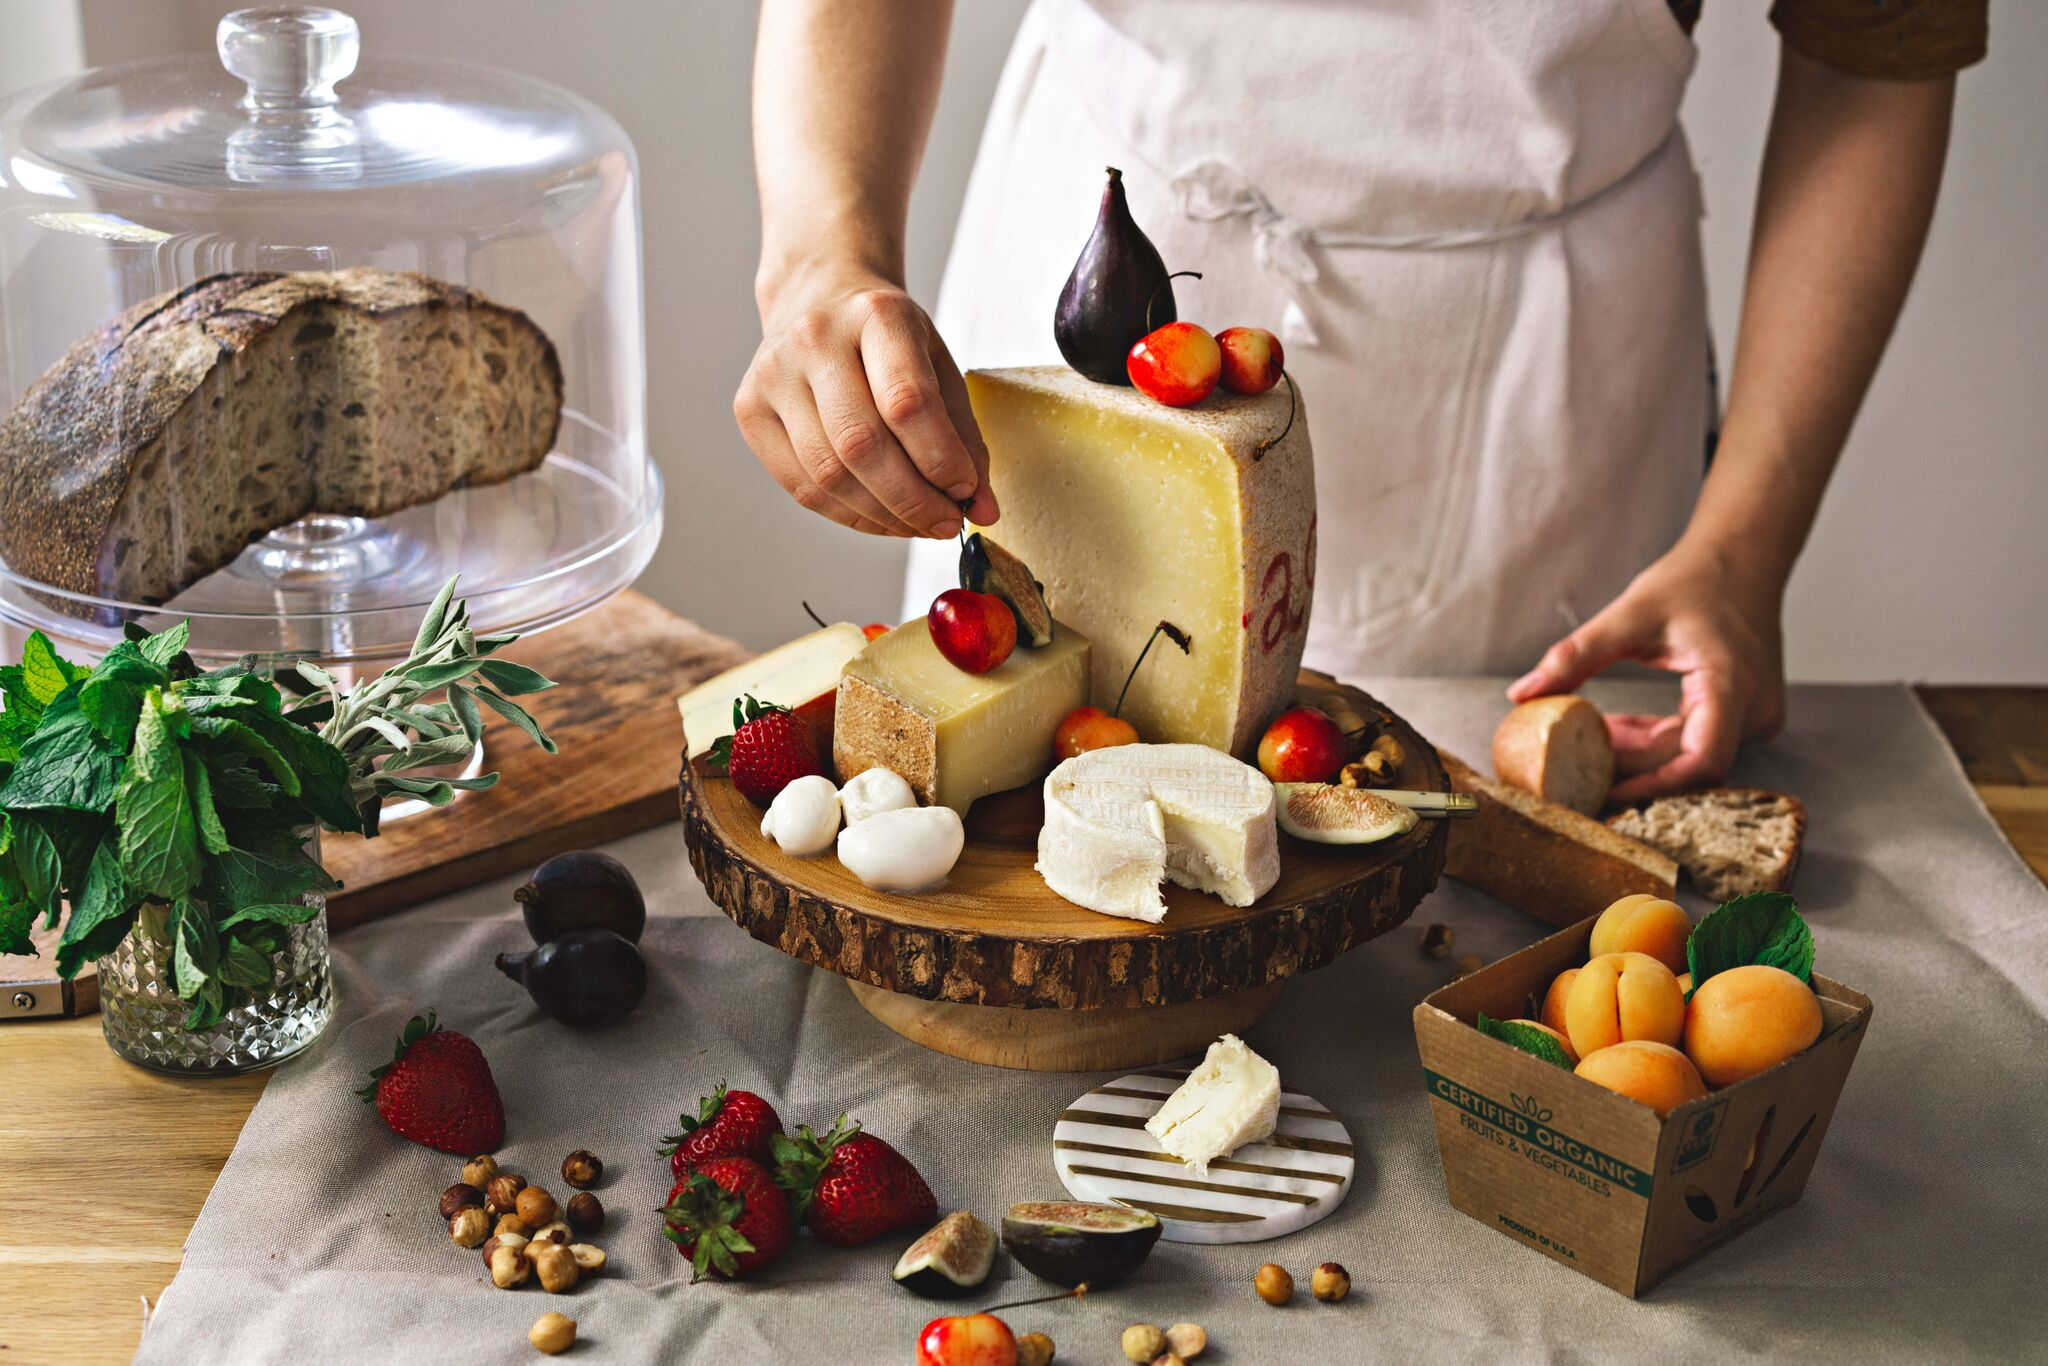 decorating-cheese.jpeg